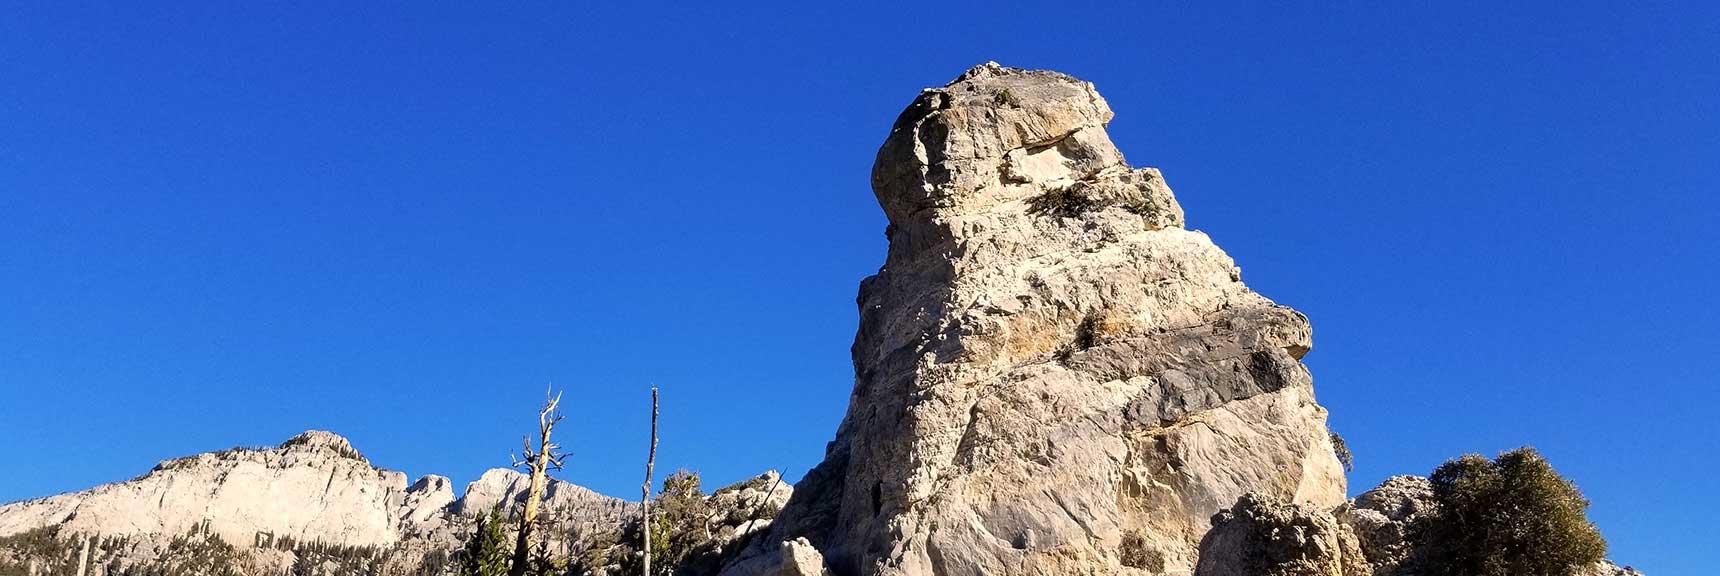 Cockscomb Peak on Cockscomb Ridge in Mt. Charleston Wilderness, Nevada